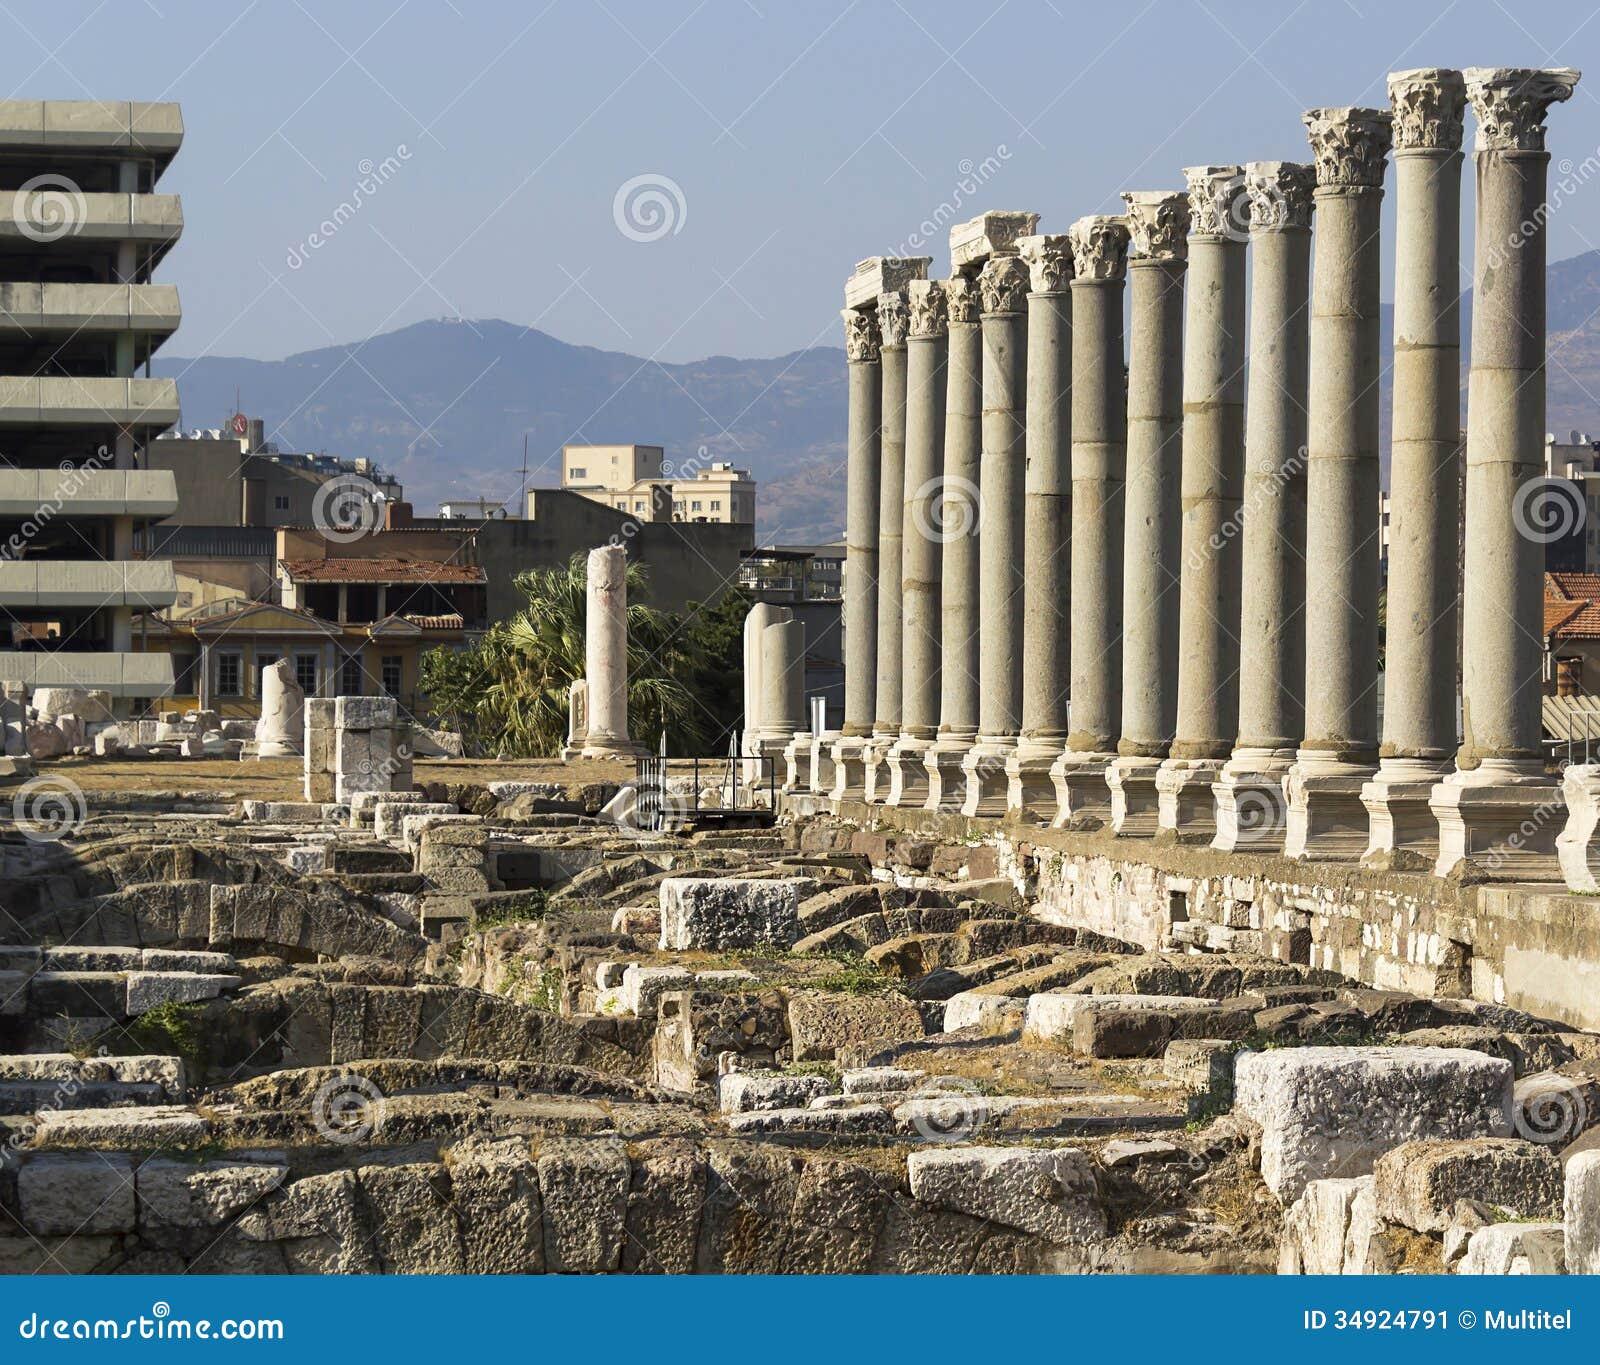 Agora Of Smyrna Stock Image - Image: 34924791